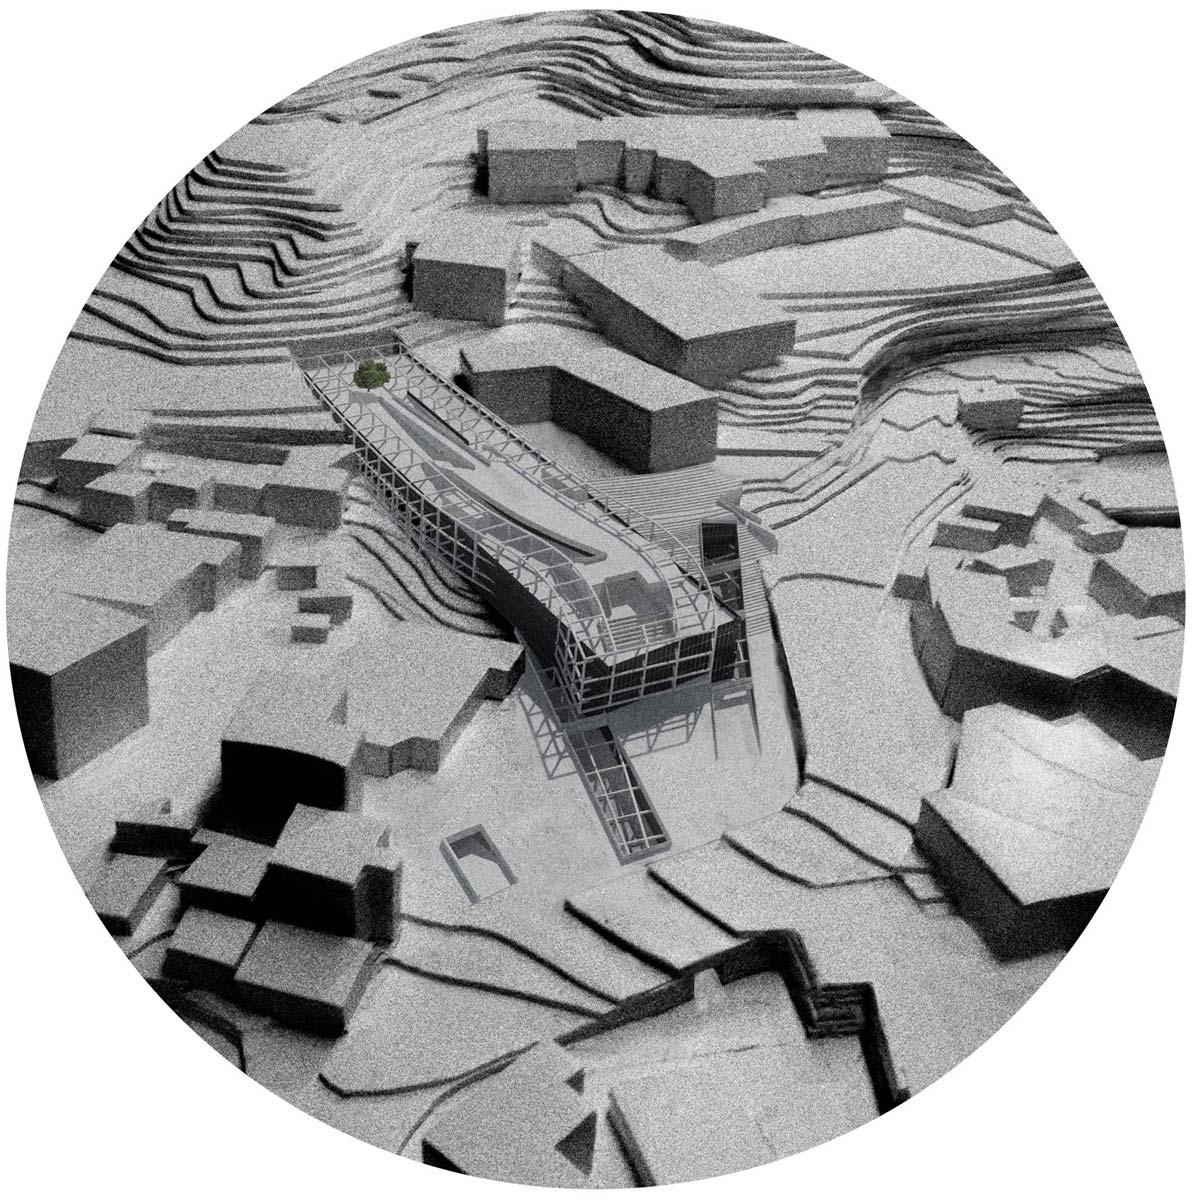 Degli-Esposti-Architetti-Seoul-Animation-Center_06